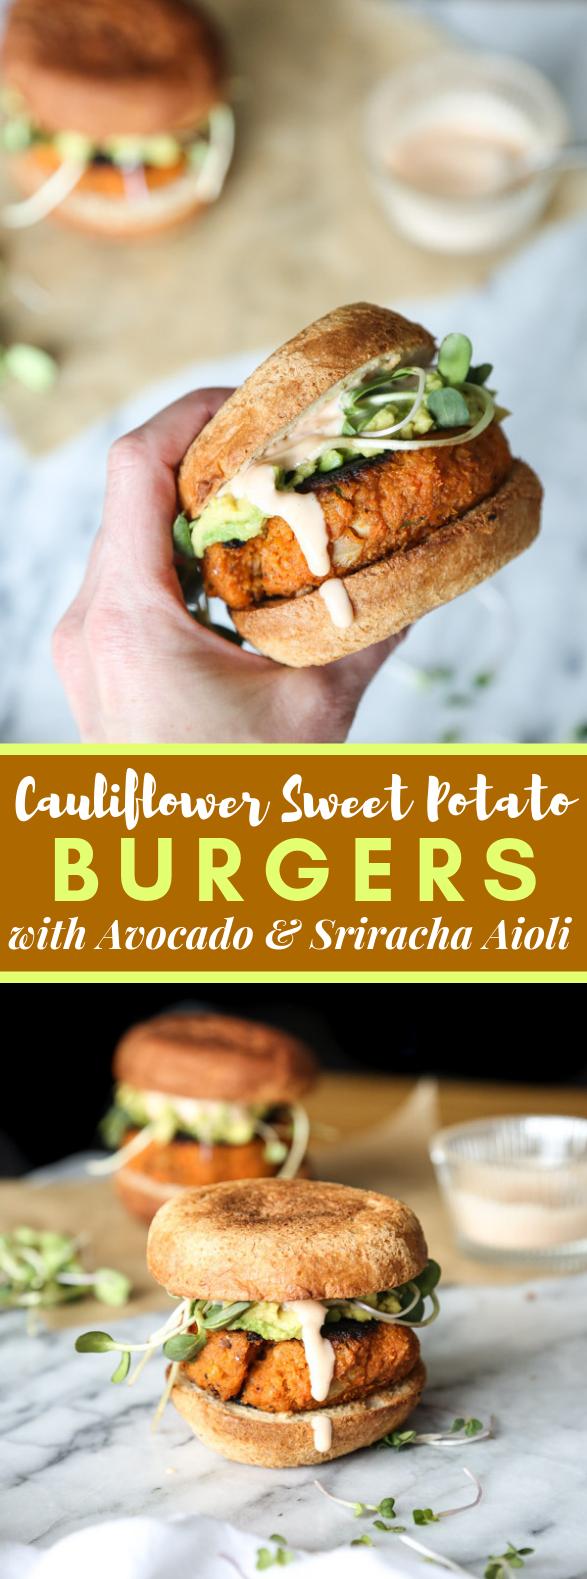 Photo of Cauliflower Sweet Potato Burgers with Avocado and Sriracha Aioli (Vegetarian Paleo) #veggies #recipes